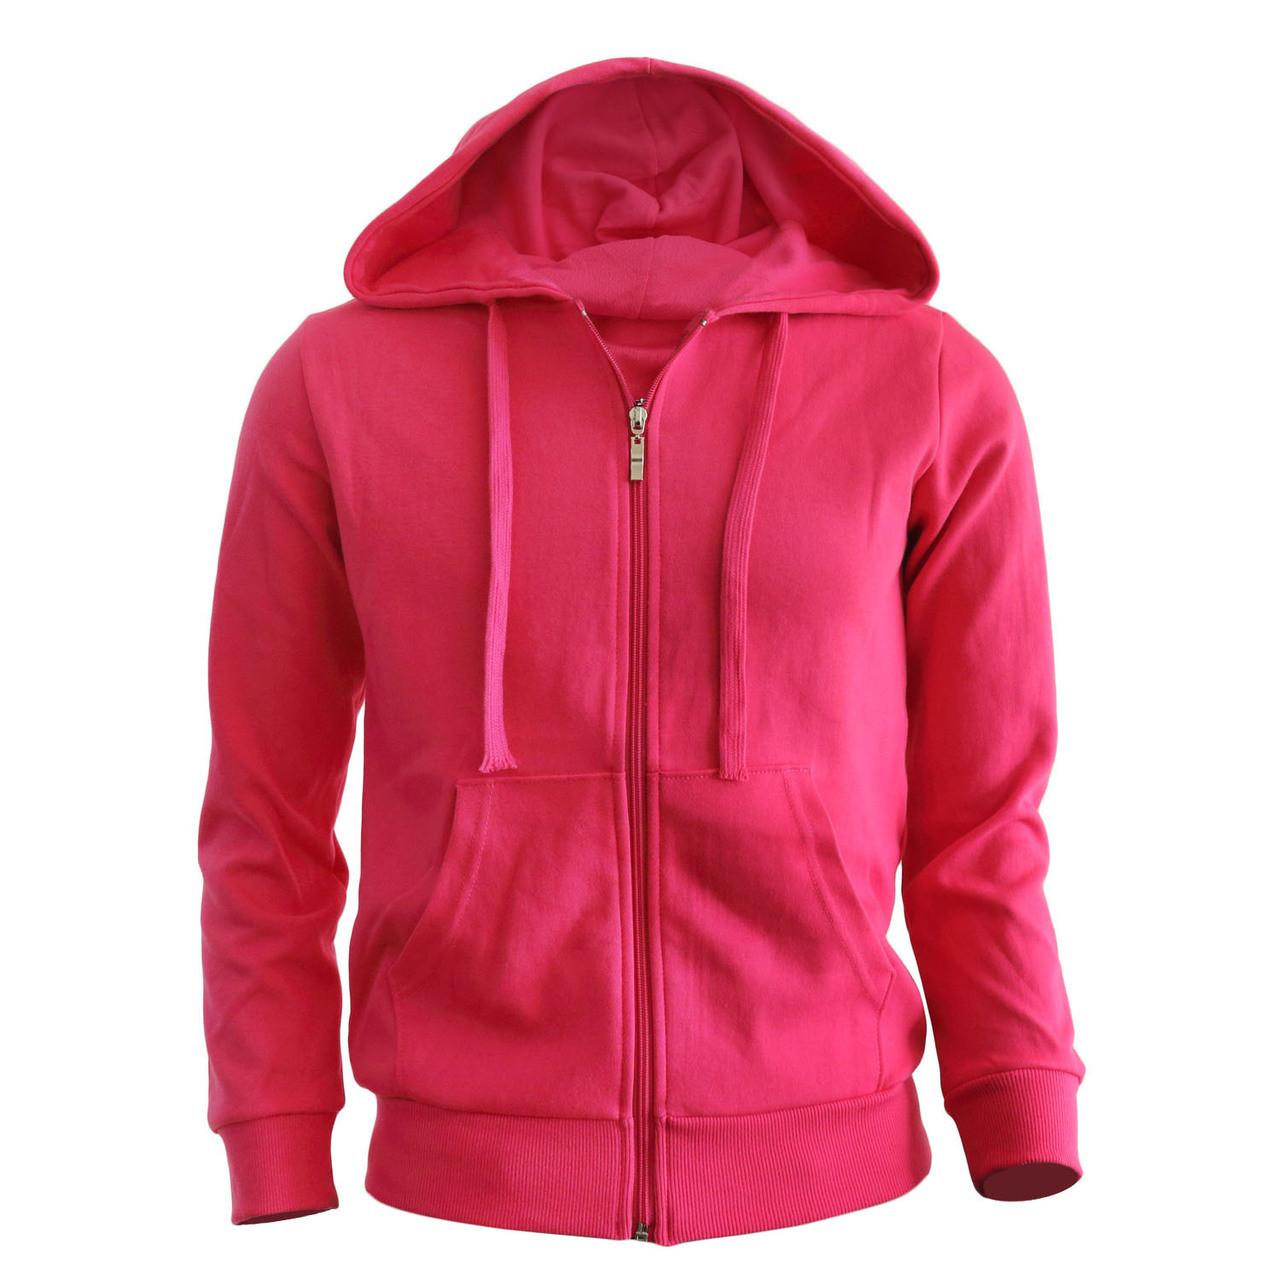 newest collection order online amazing selection zip hoodie Hot pink hoodie Plain Solid zip up hoodie